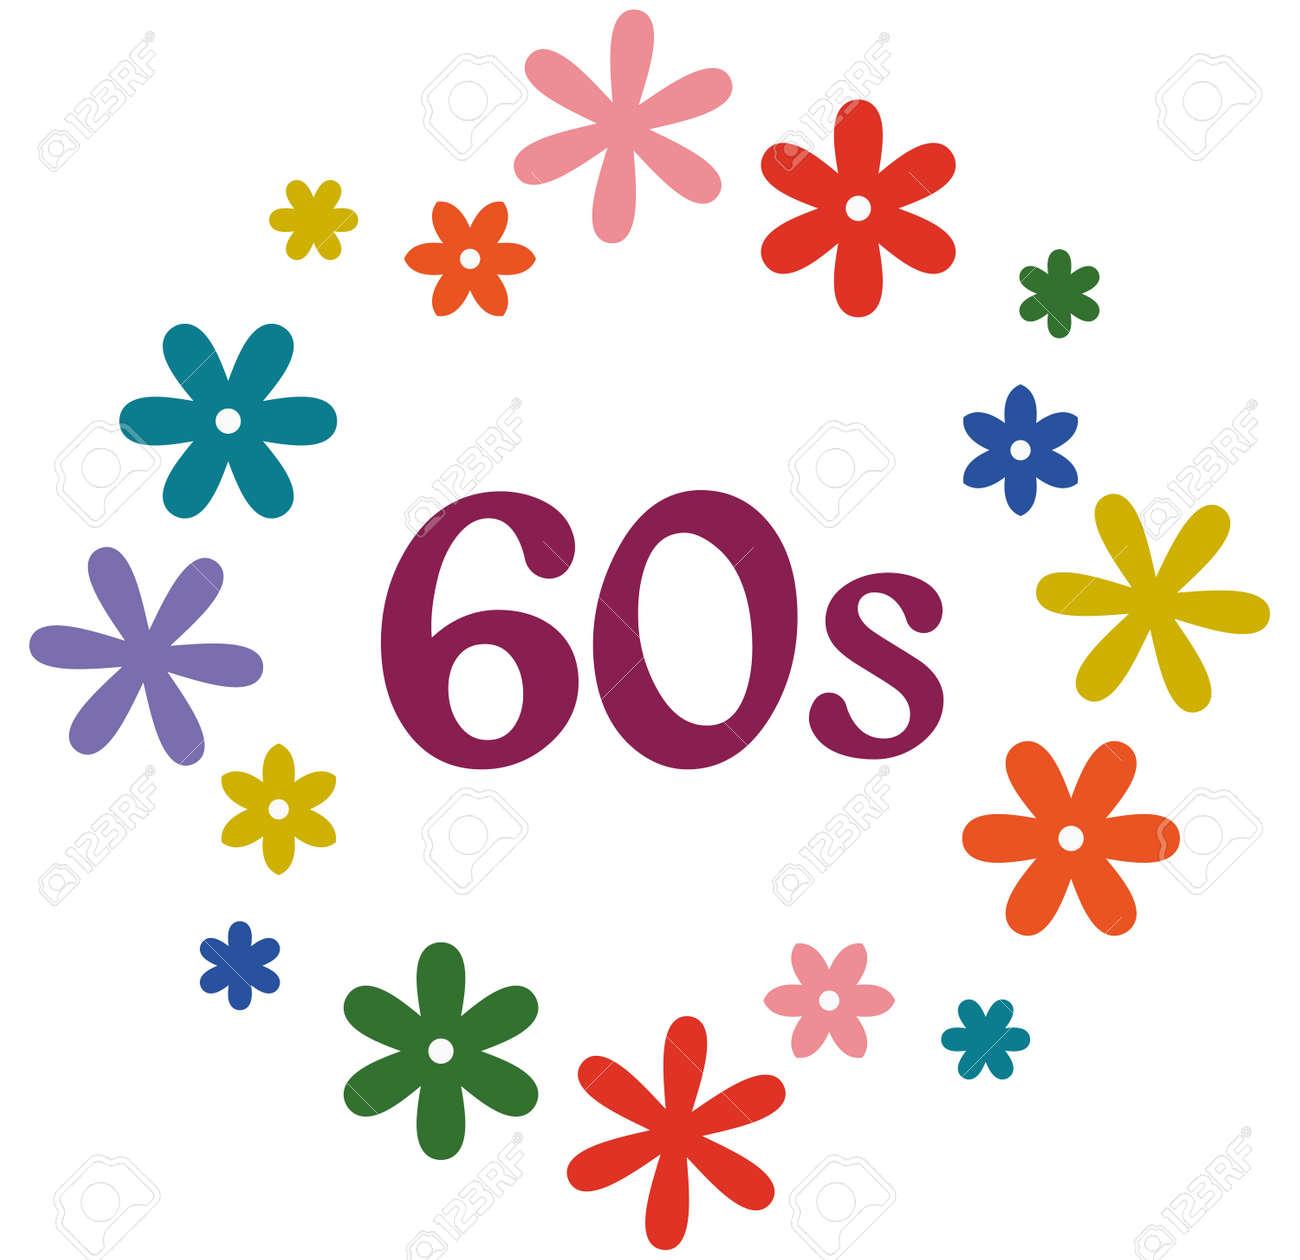 60s Flower Power Retro Style Design Illustration Royalty Free Cliparts Vetores E Ilustracoes Stock Image 43675328